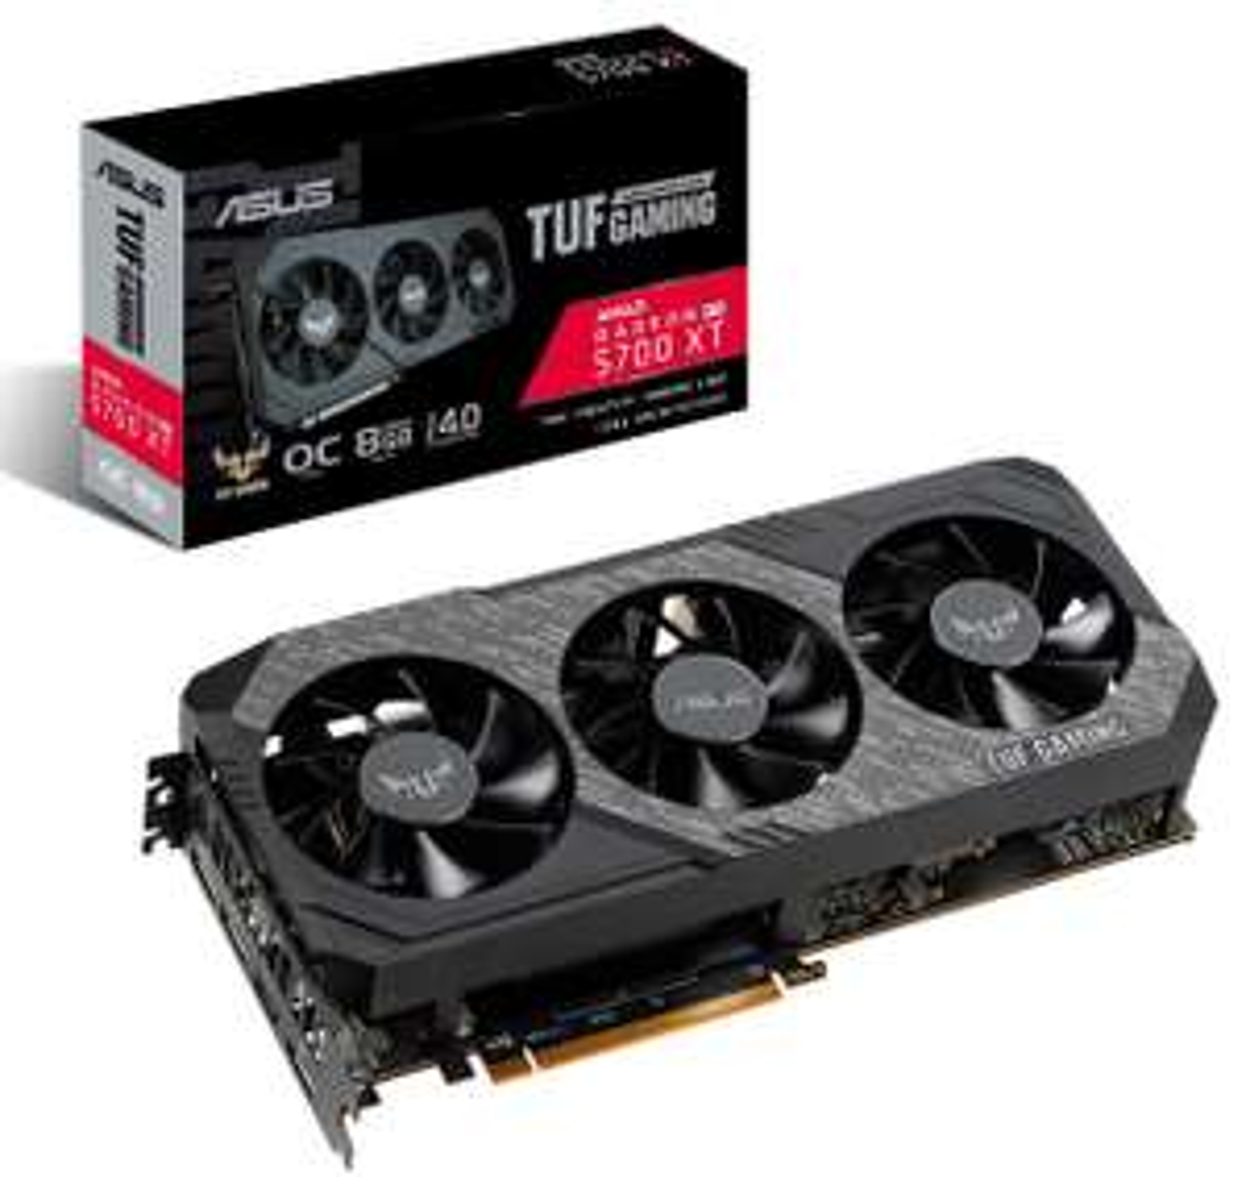 ASUS Radeon 5700 XT TUF Gaming OC bei Media Markt / Saturn (30€ ASUS Cashback bis 30.05.)